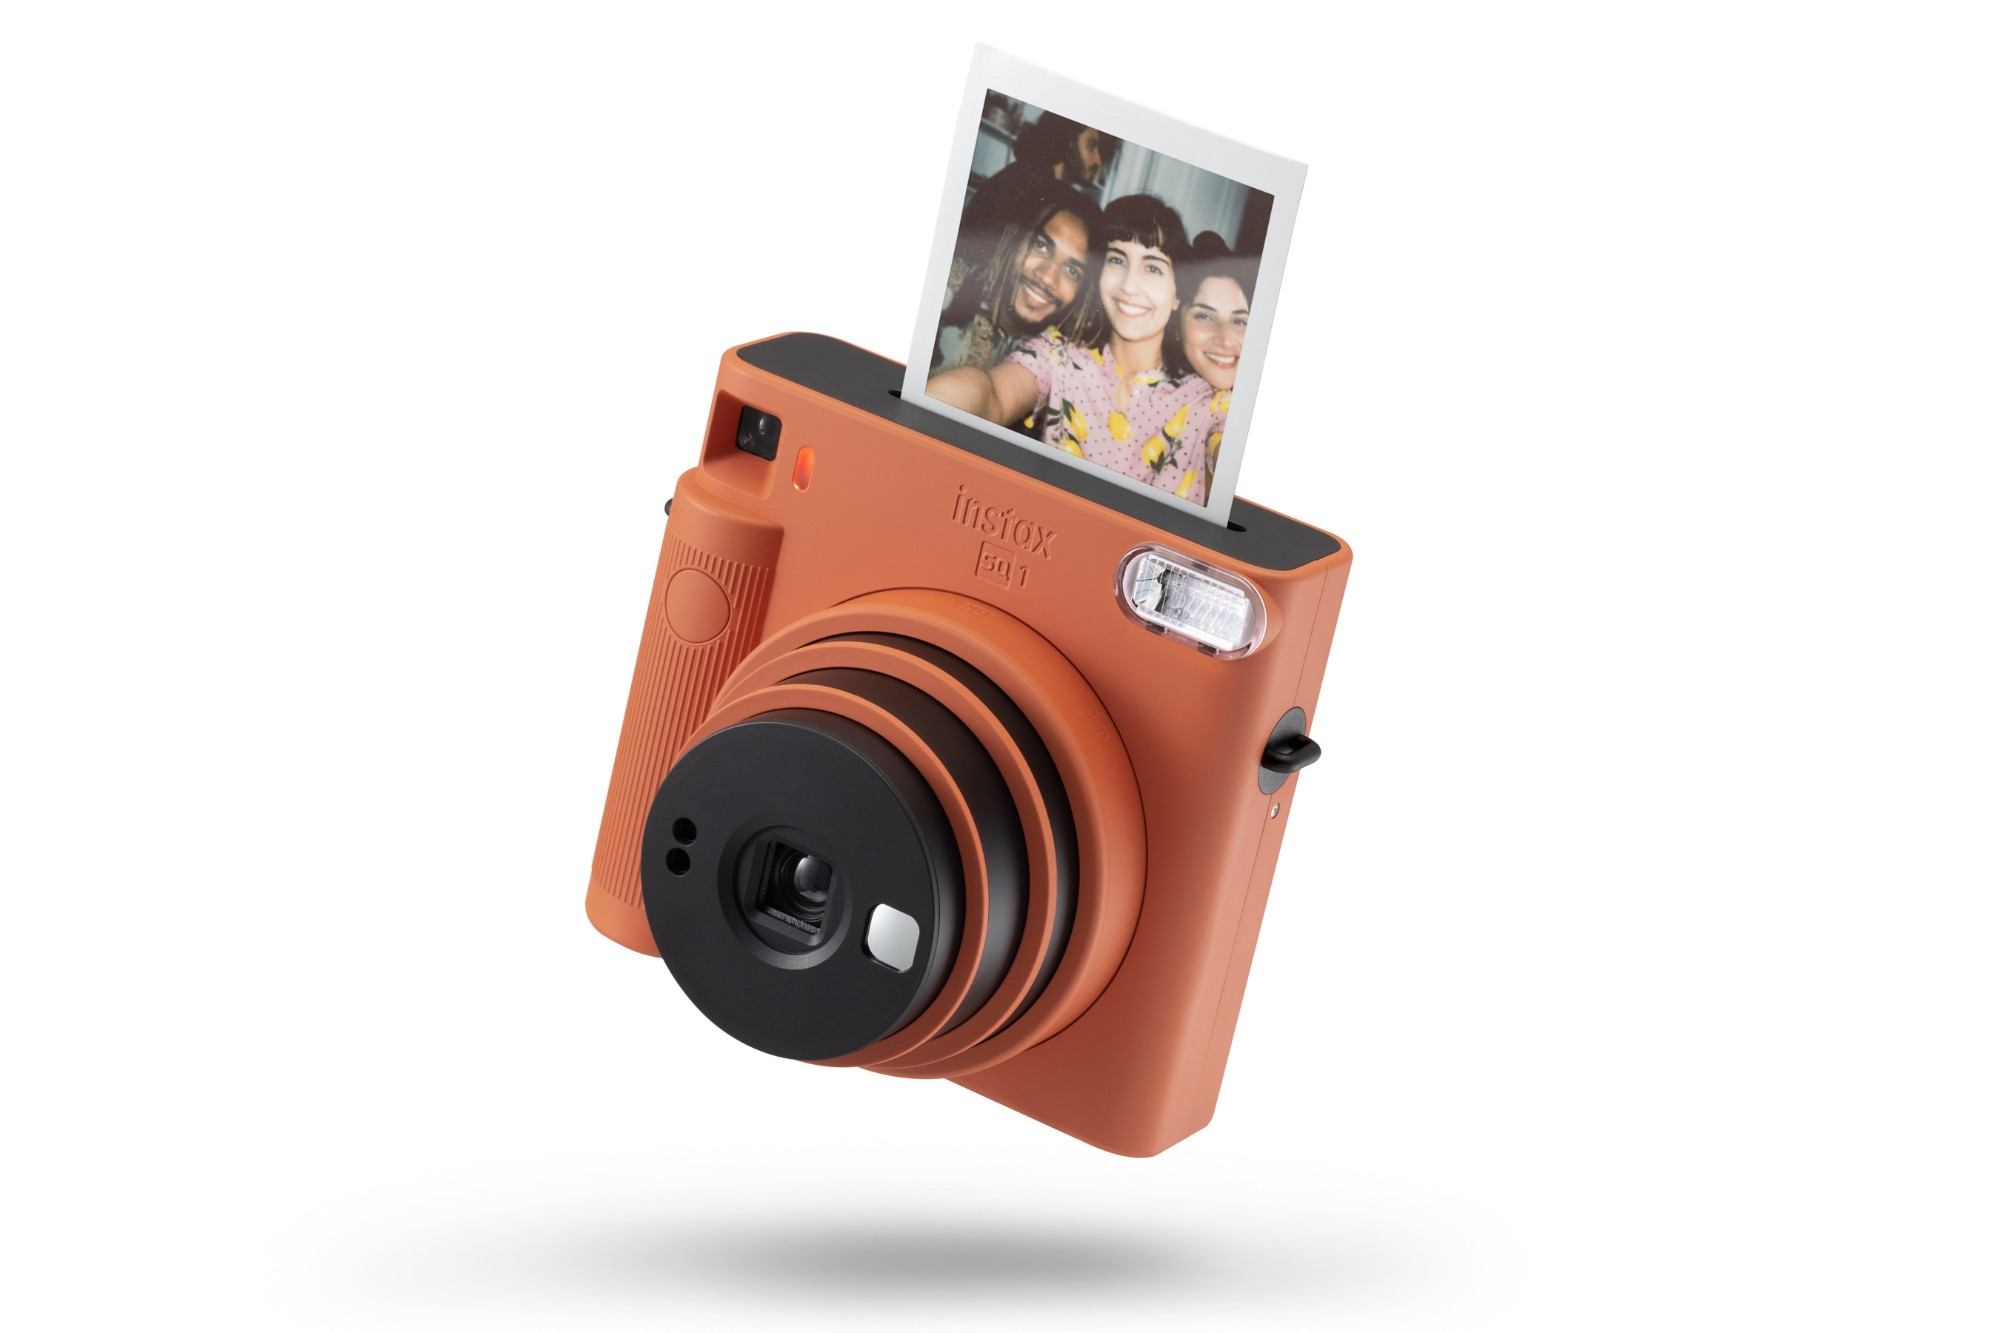 Fujifilm Instax Square SQ1 Instant Camera (10 Shots) - Terracotta Orange